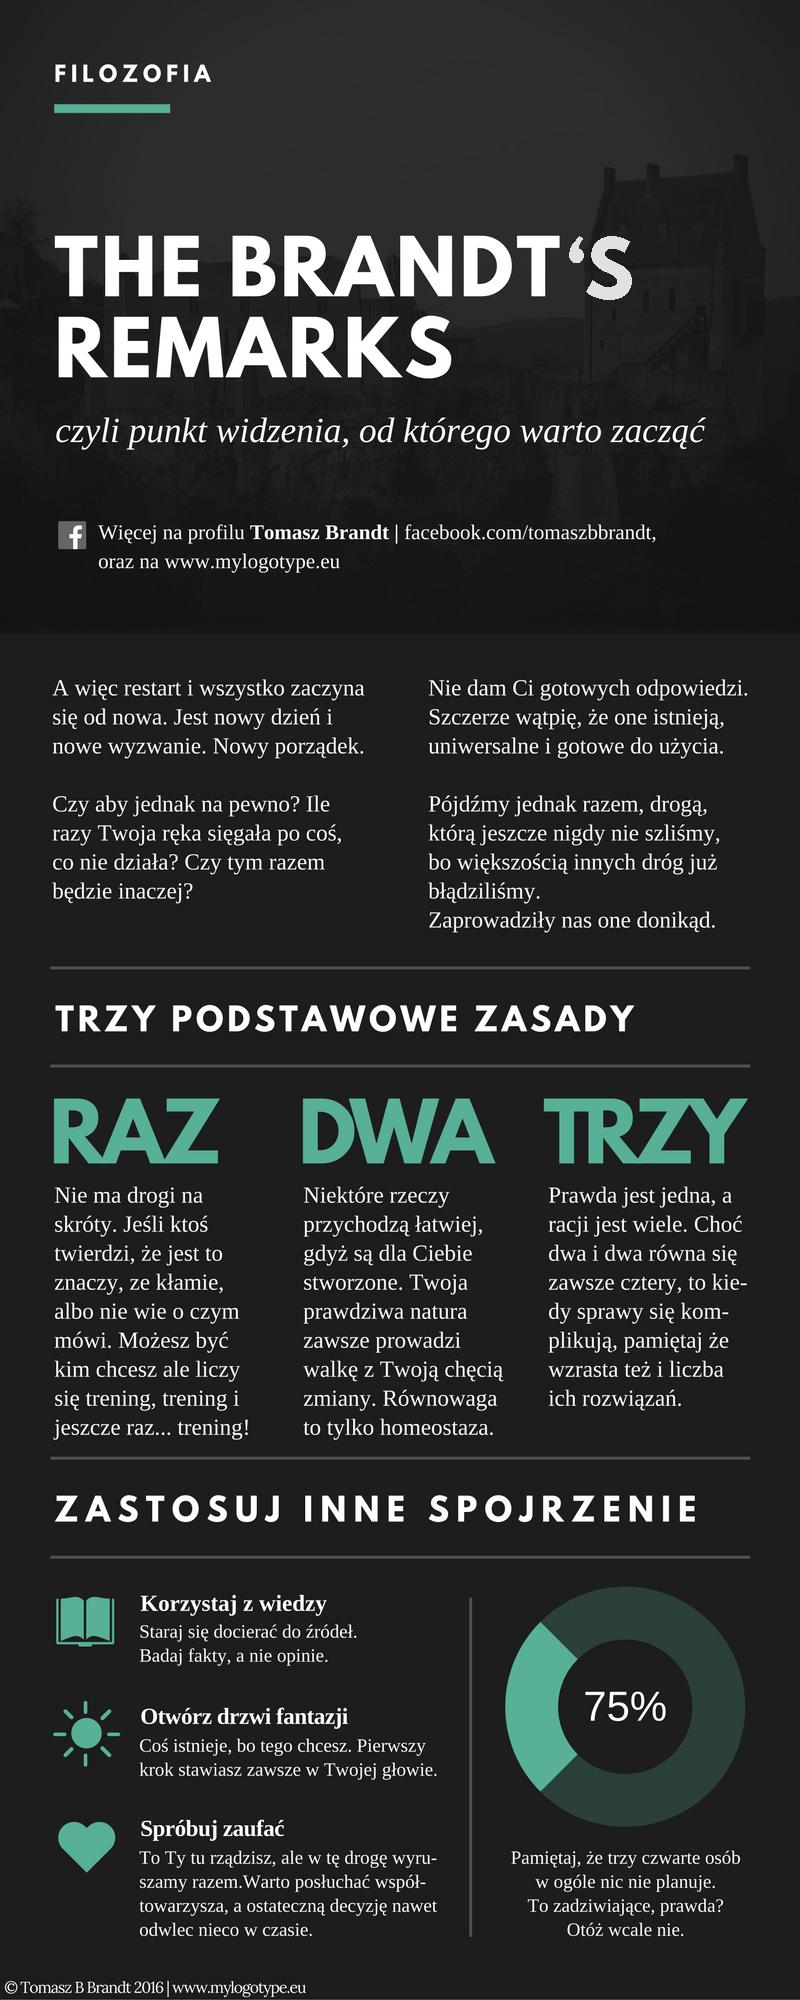 true-philosophy-tomasz-b-brandt